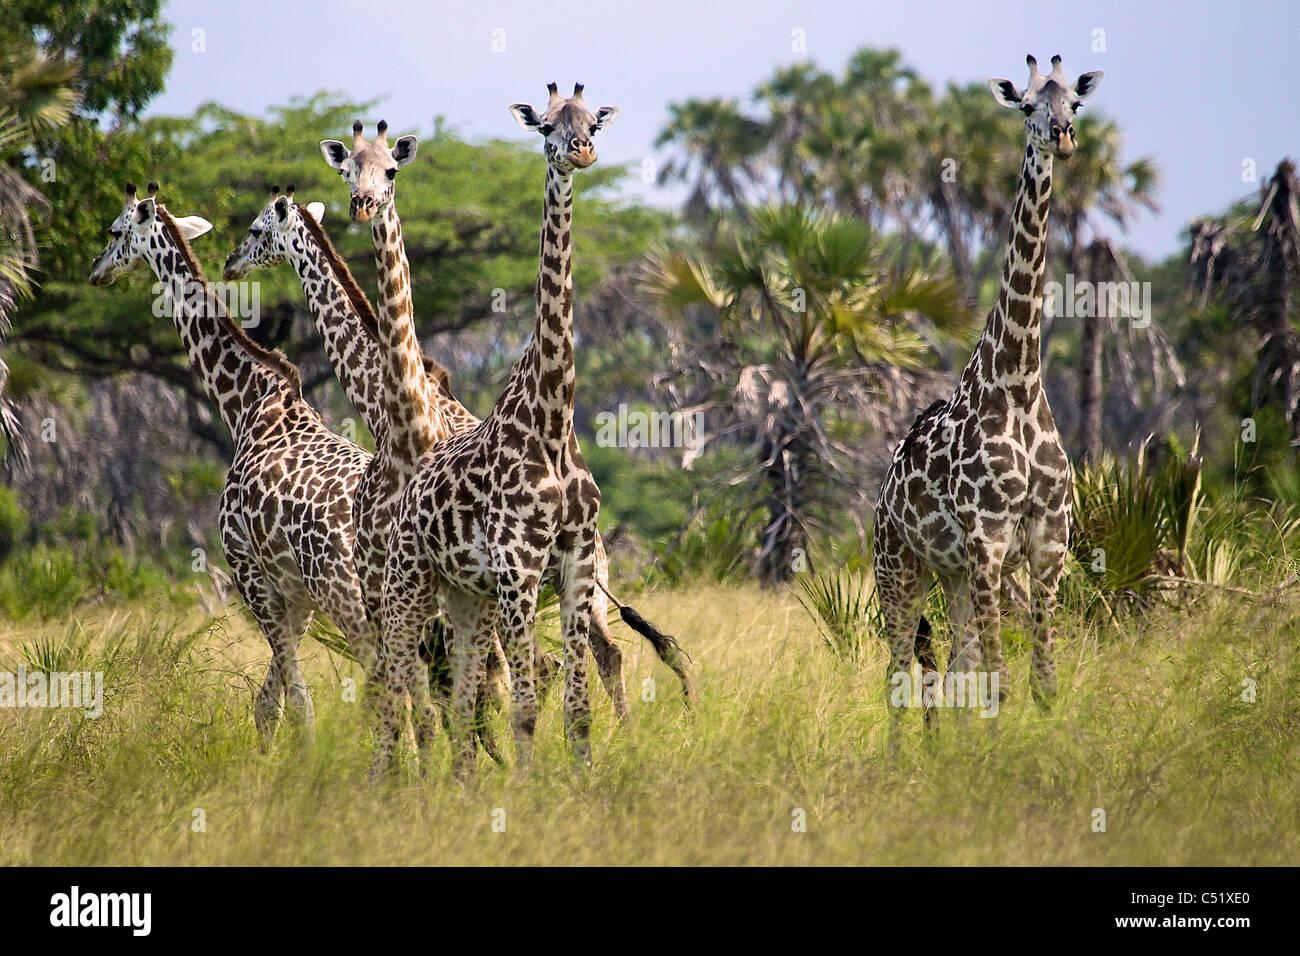 Giraffa camelopardalis Giraffa Saadani Tanzania Africa Immagini Stock